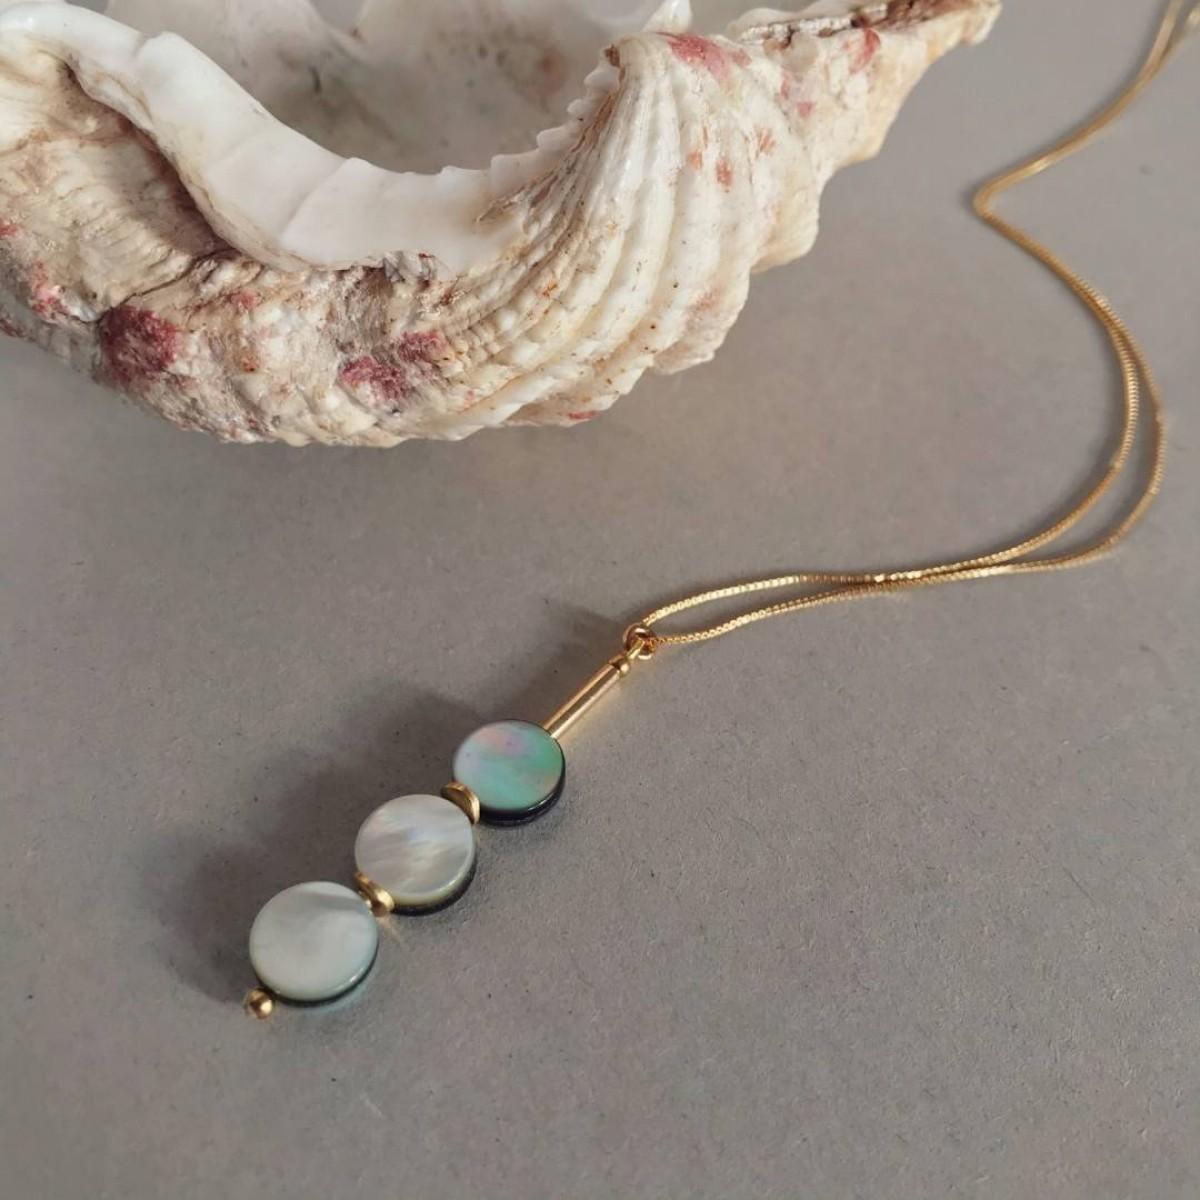 IDA PING Jewelry // GENTLE SEA NECKLACE N'1